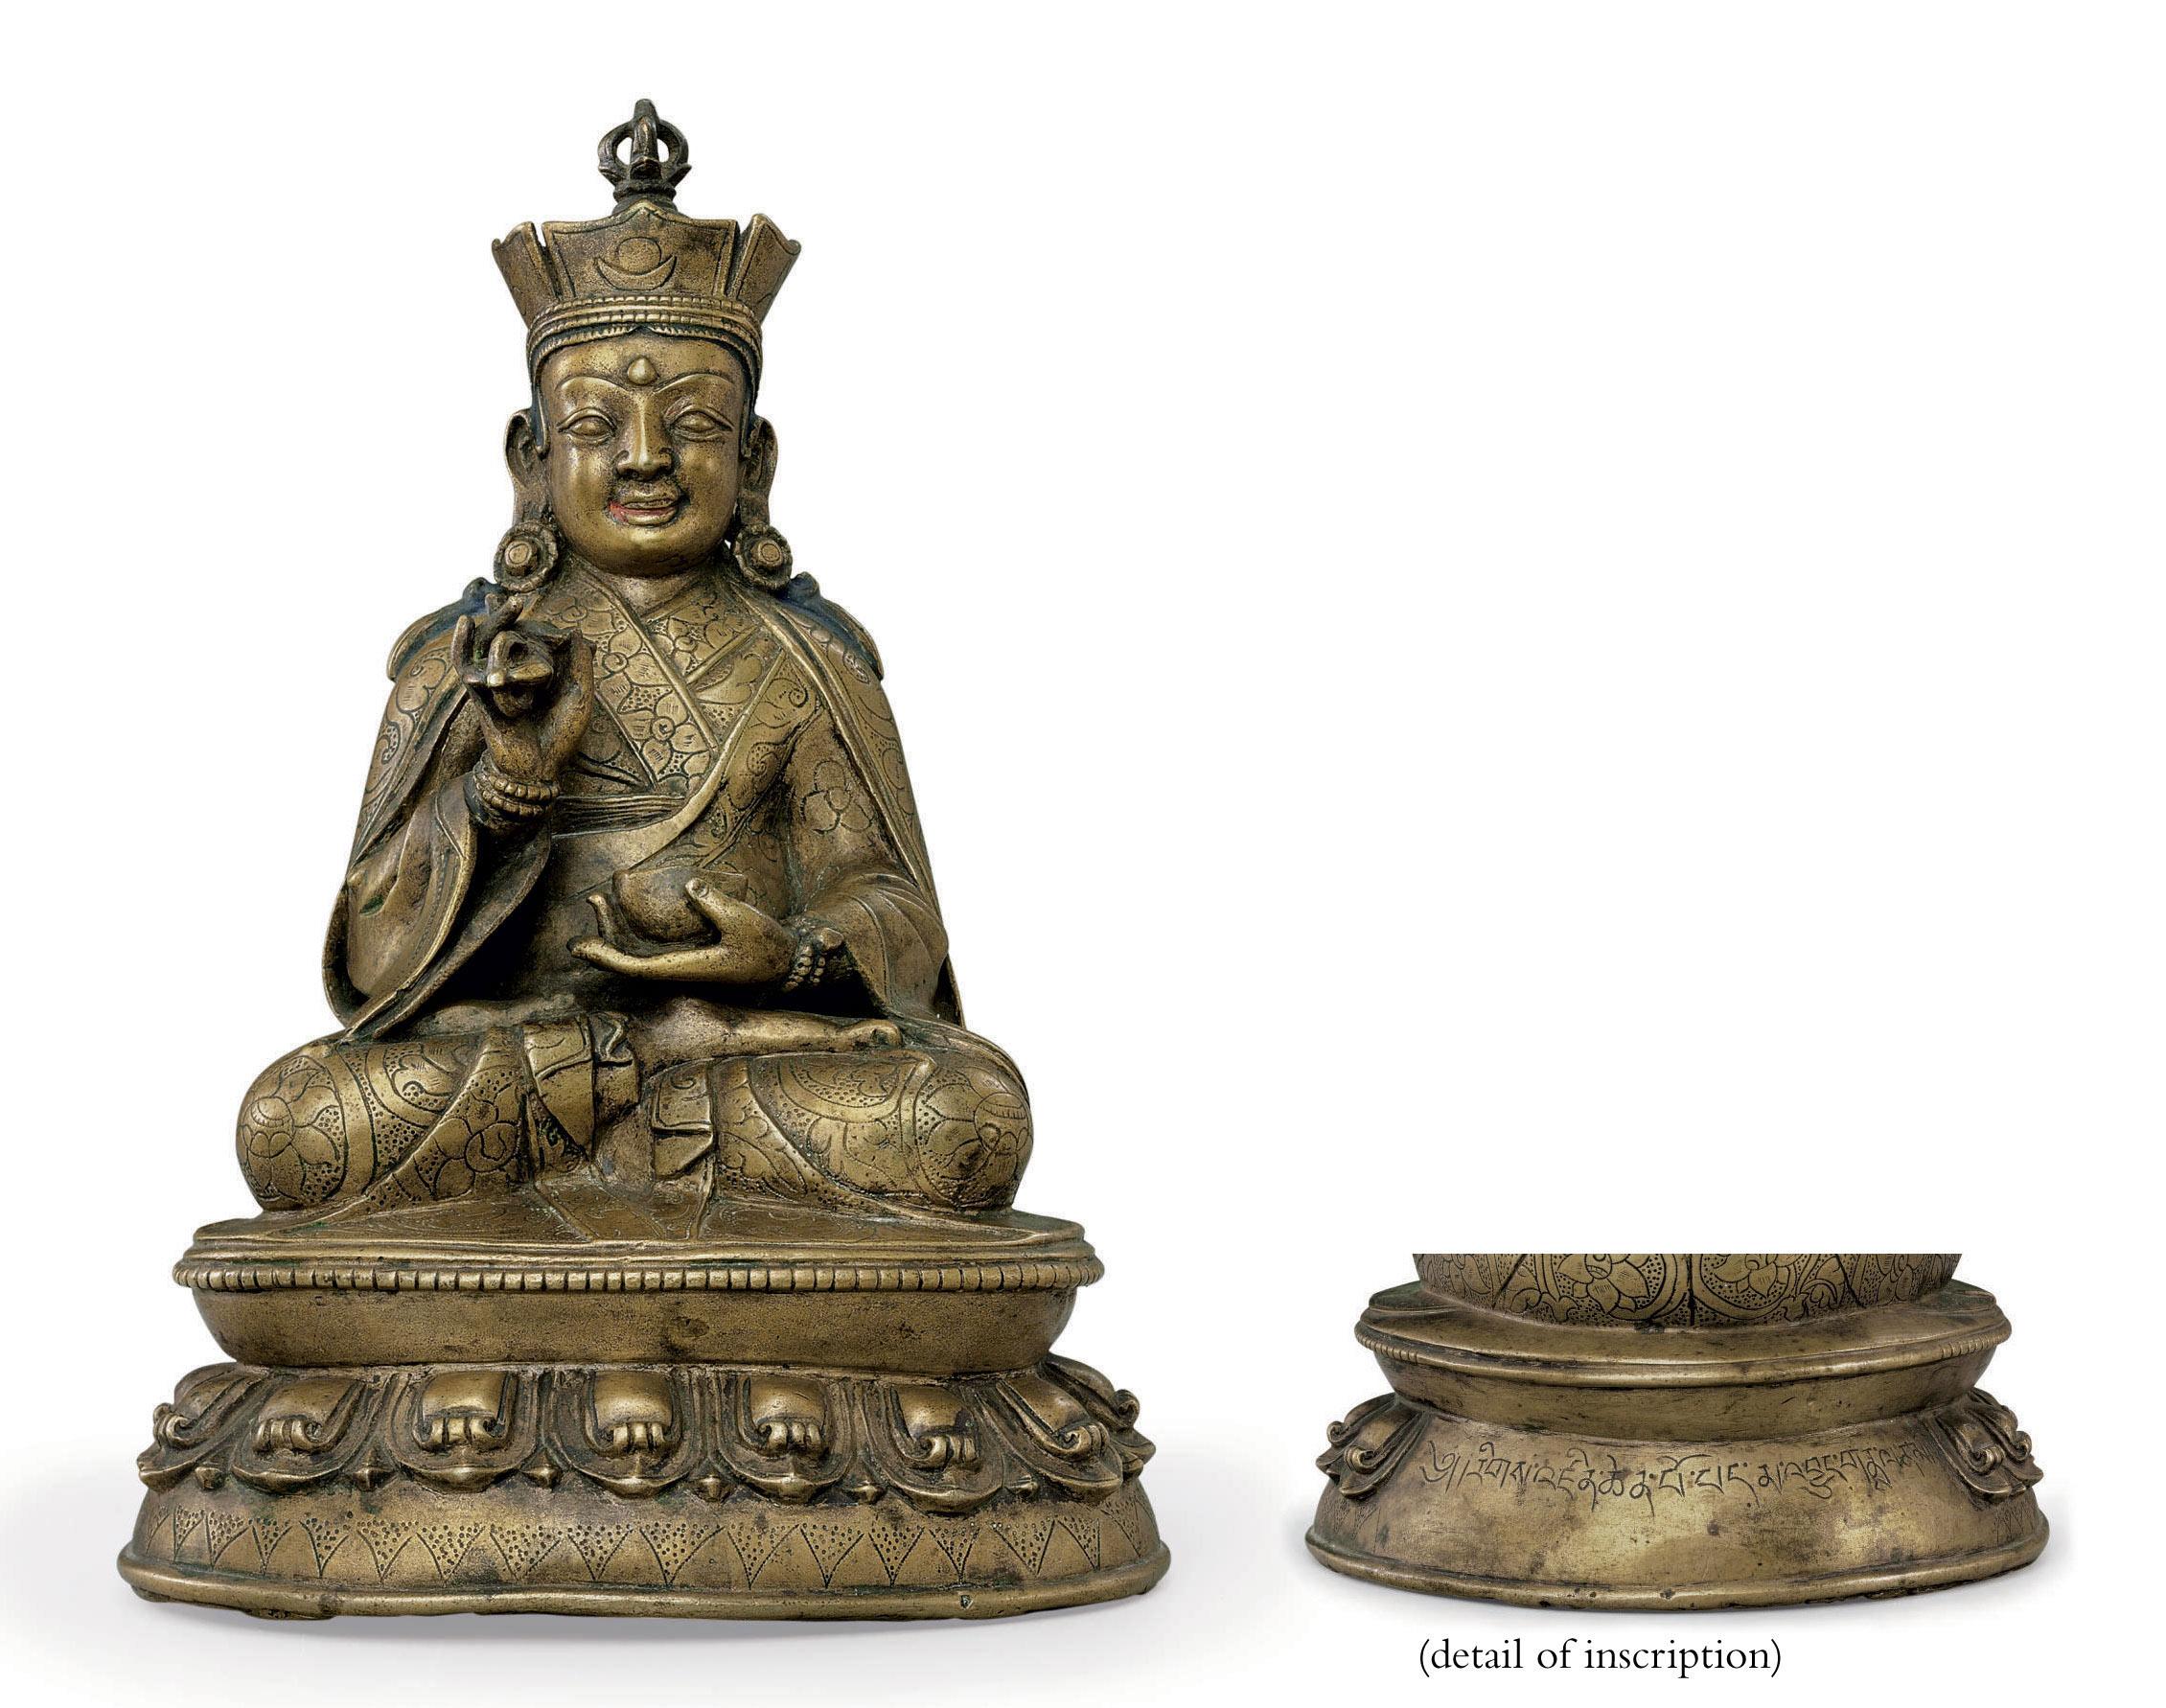 A bronze figure of Padmasambha